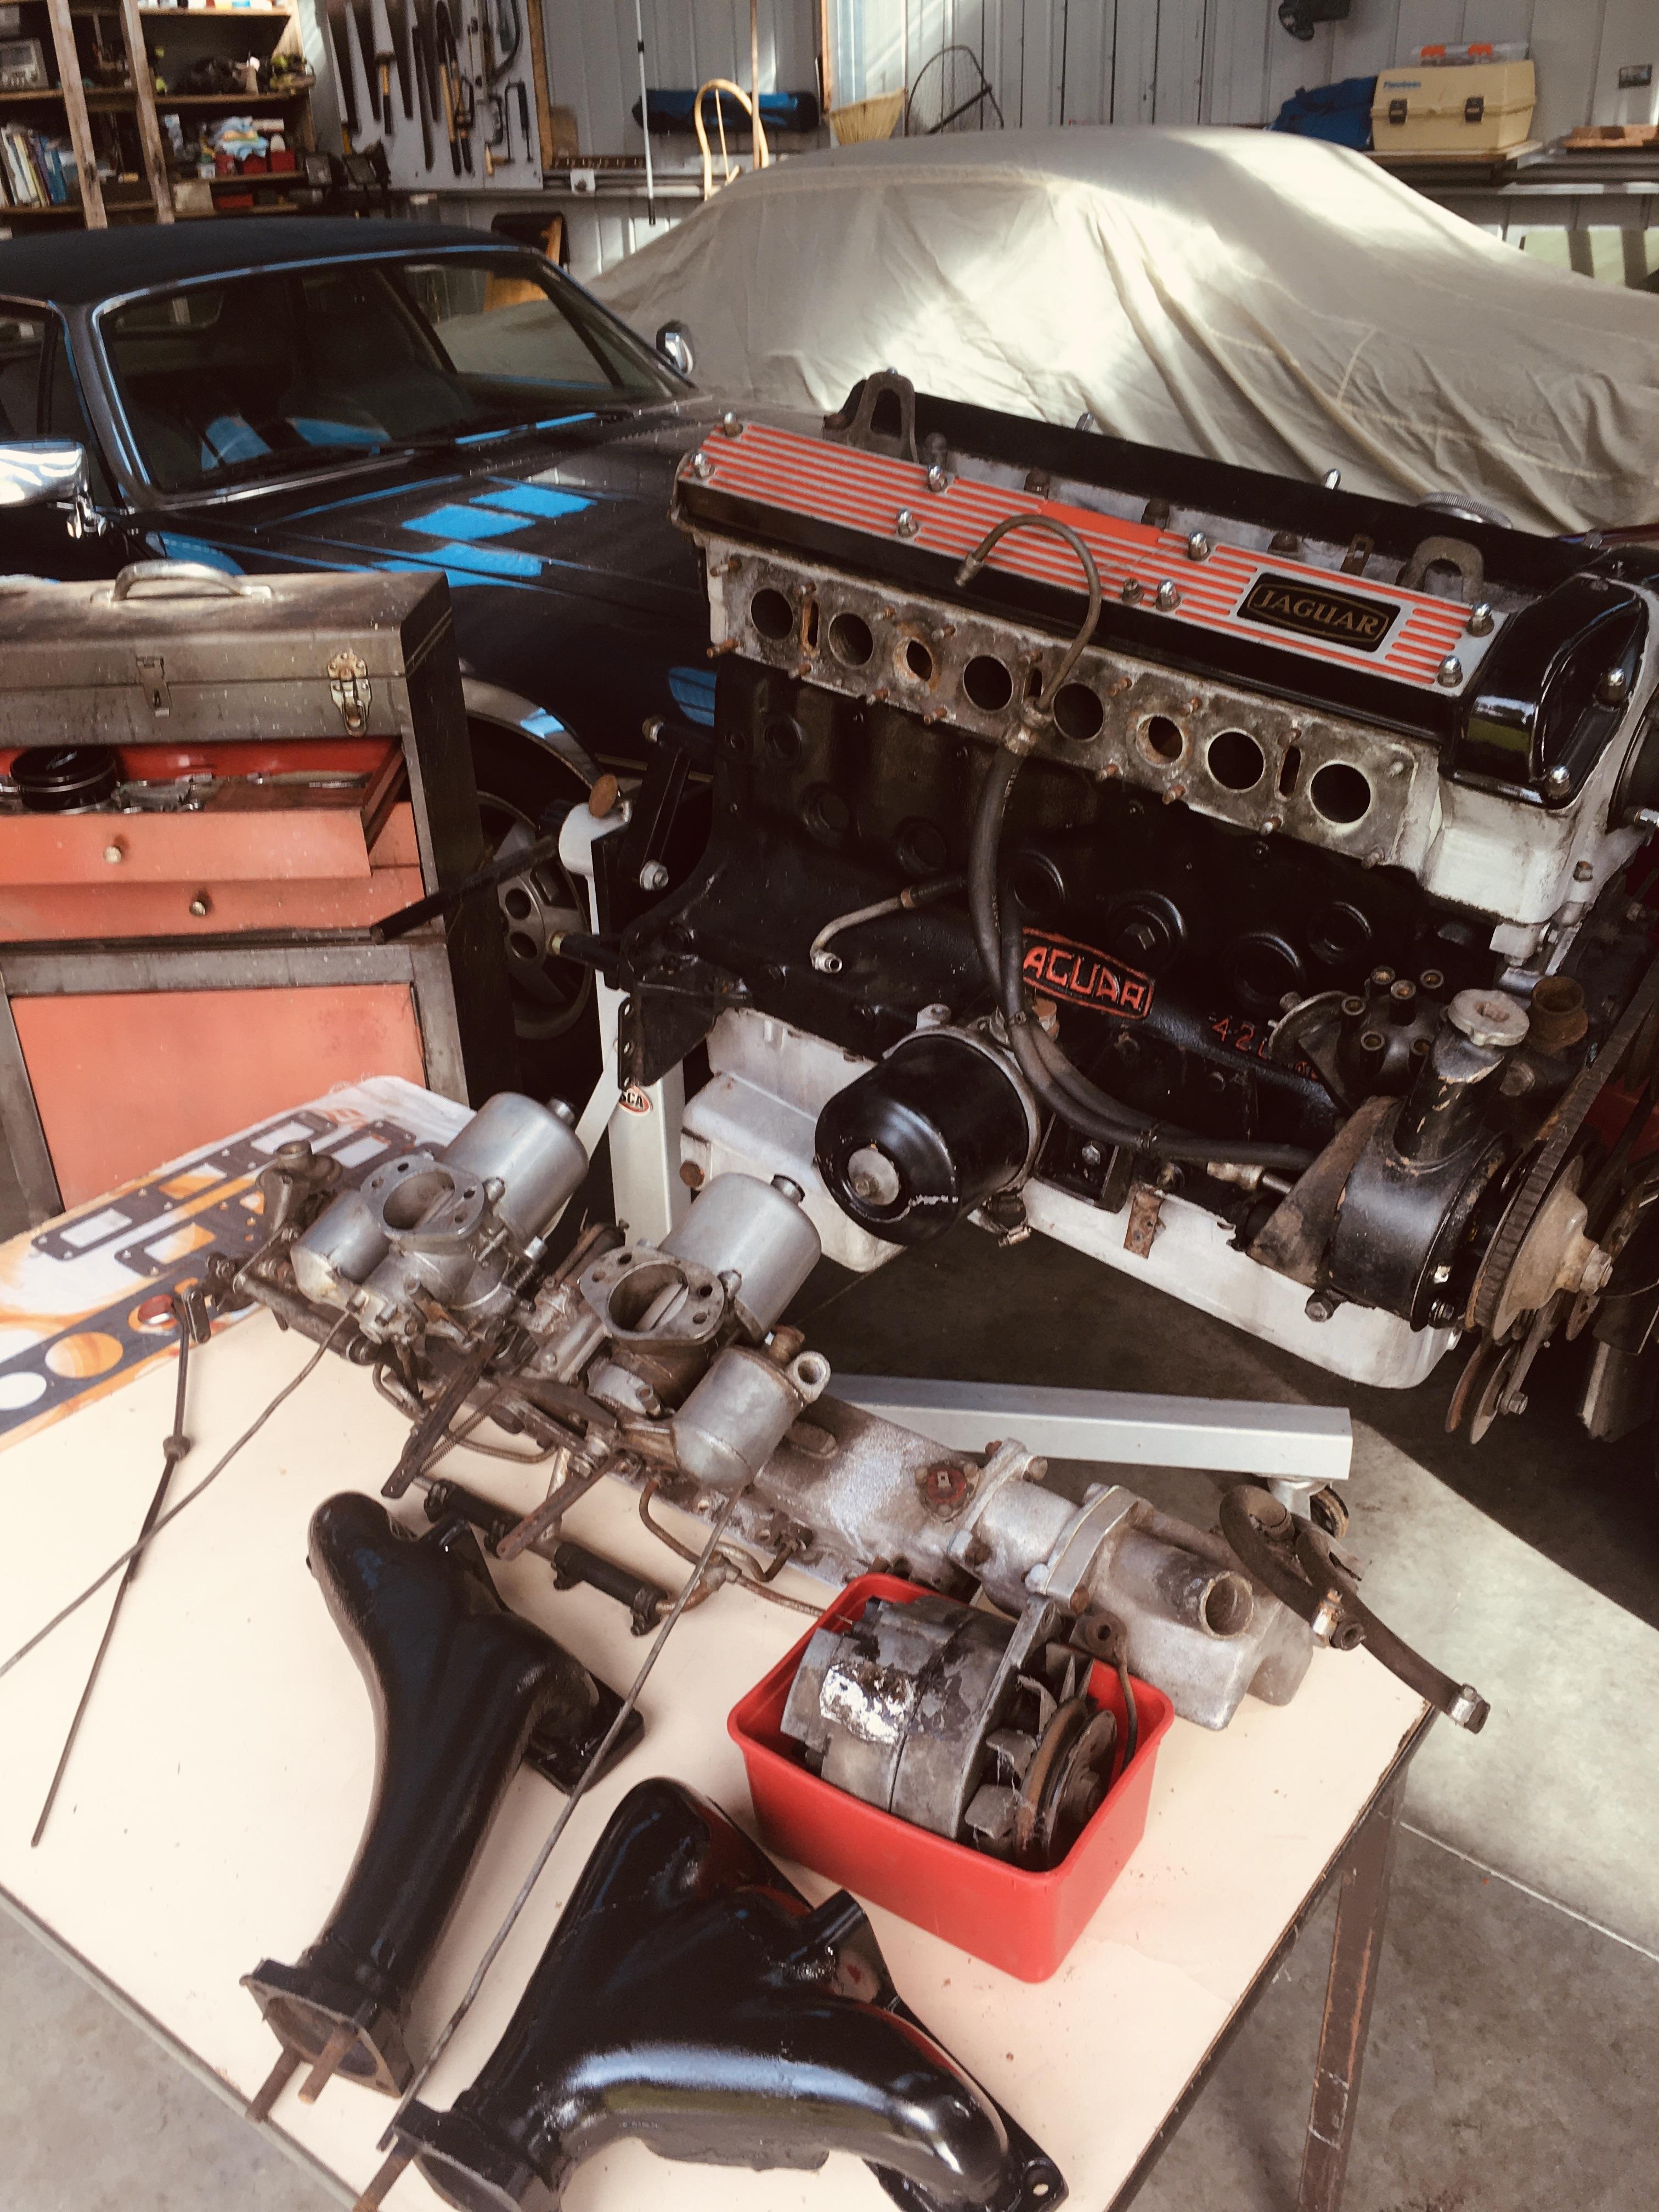 Jaguar-XJ6-Series-1-engine-rebuild